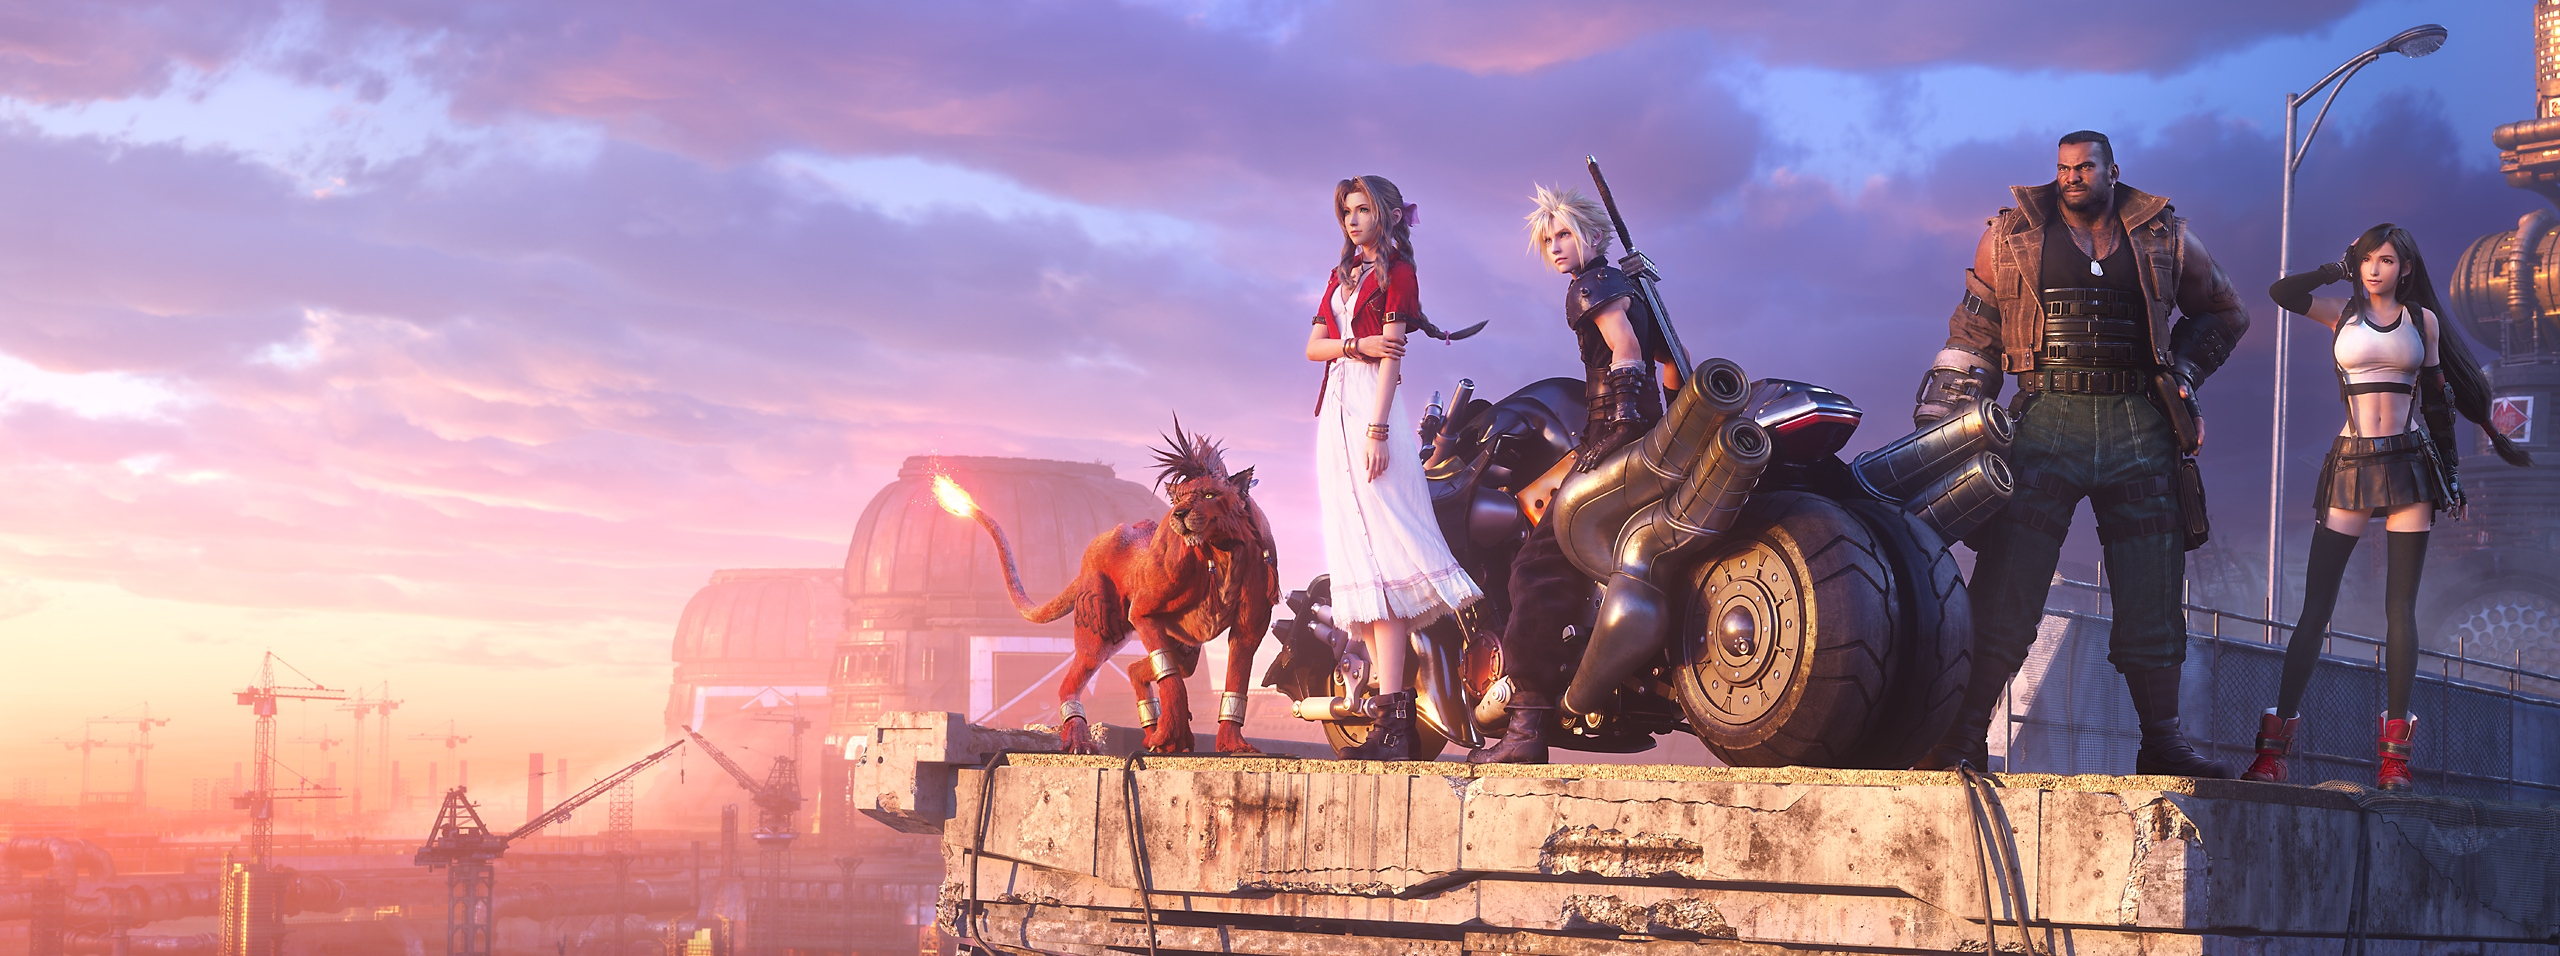 Final Fantasy VII Remake Intergrade - Key Art